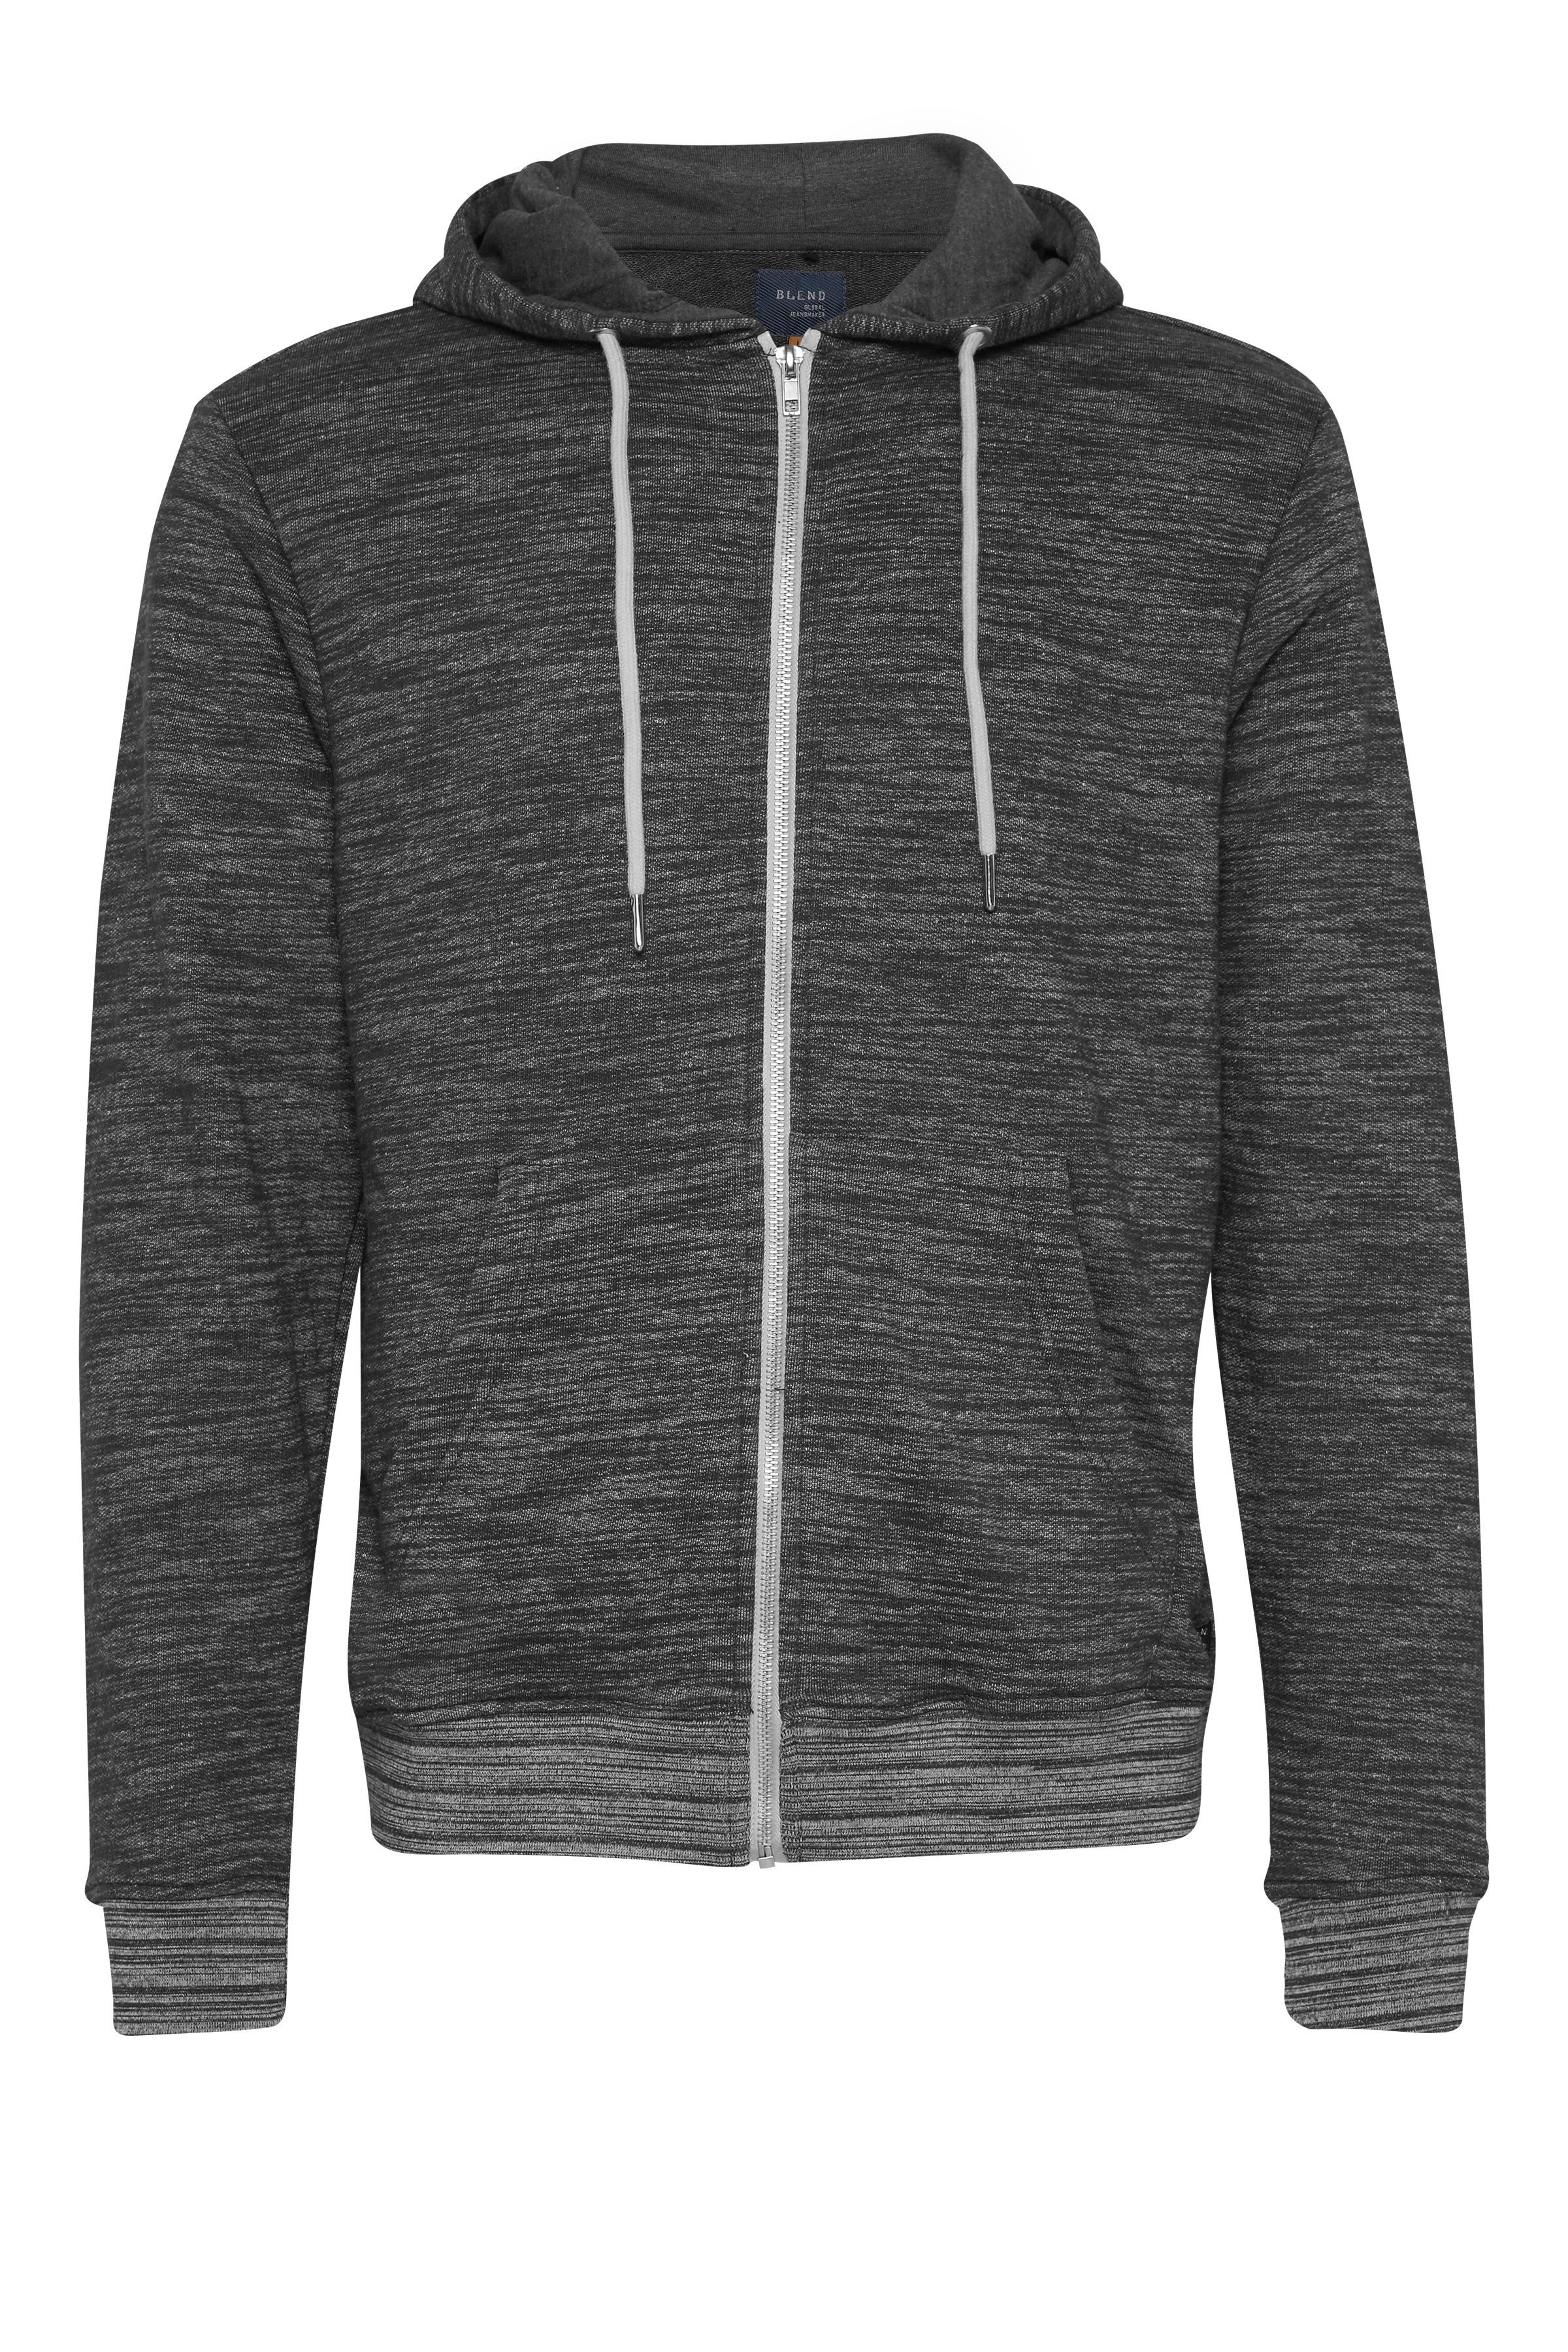 Blend He Herre Sweatshirt - Charcoal